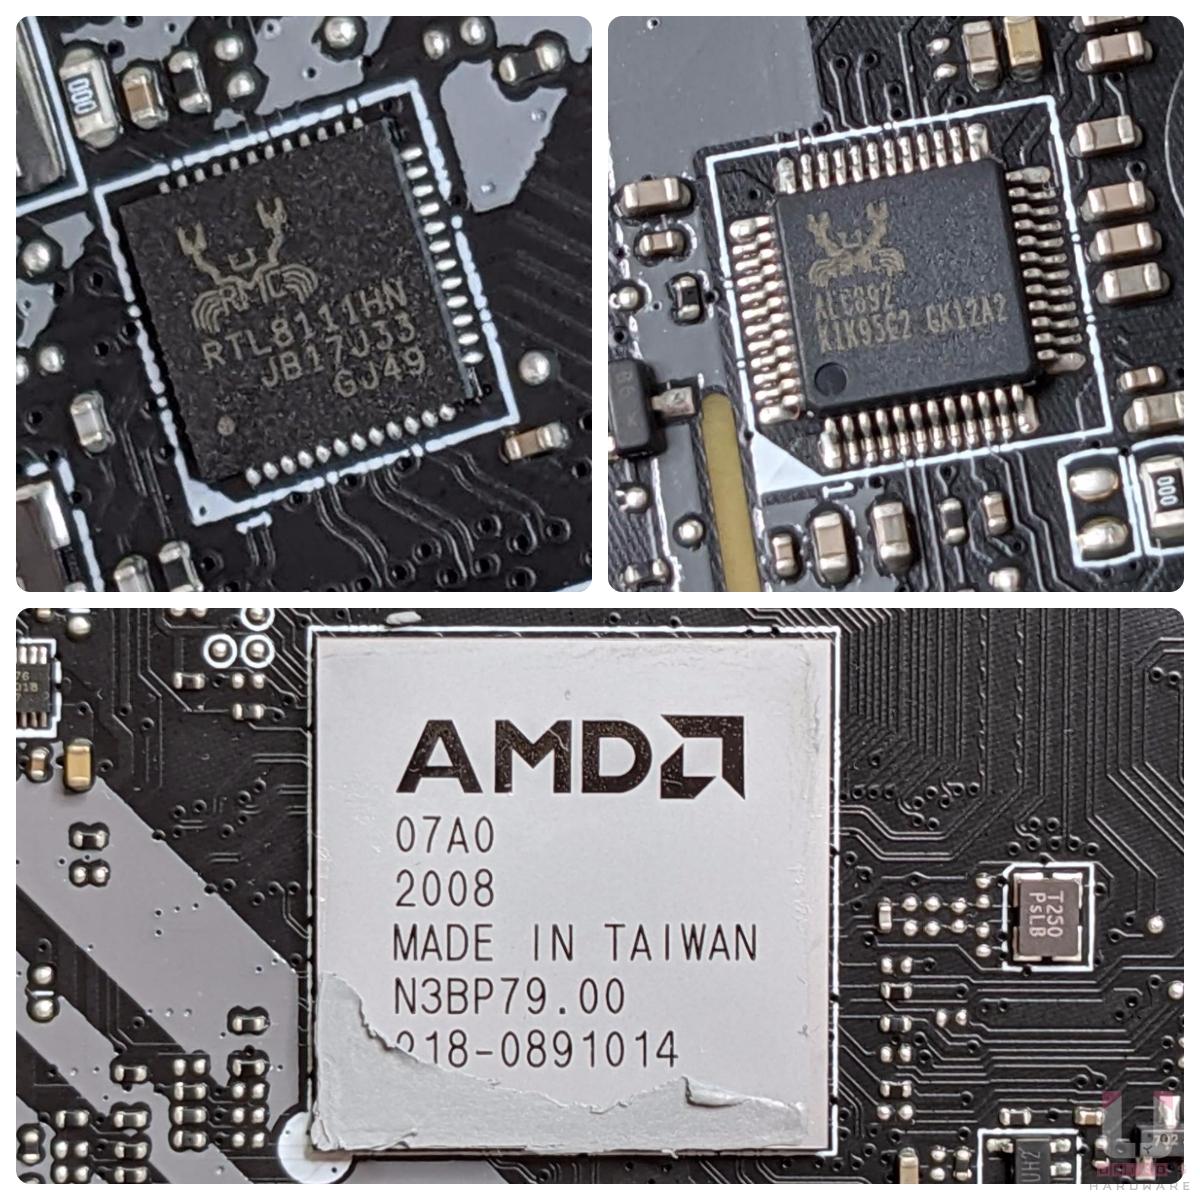 Realtek RTL8111HN 1Gbps 網路控制器、Realtek ALC892 解碼晶片,AMD B550 晶片組。